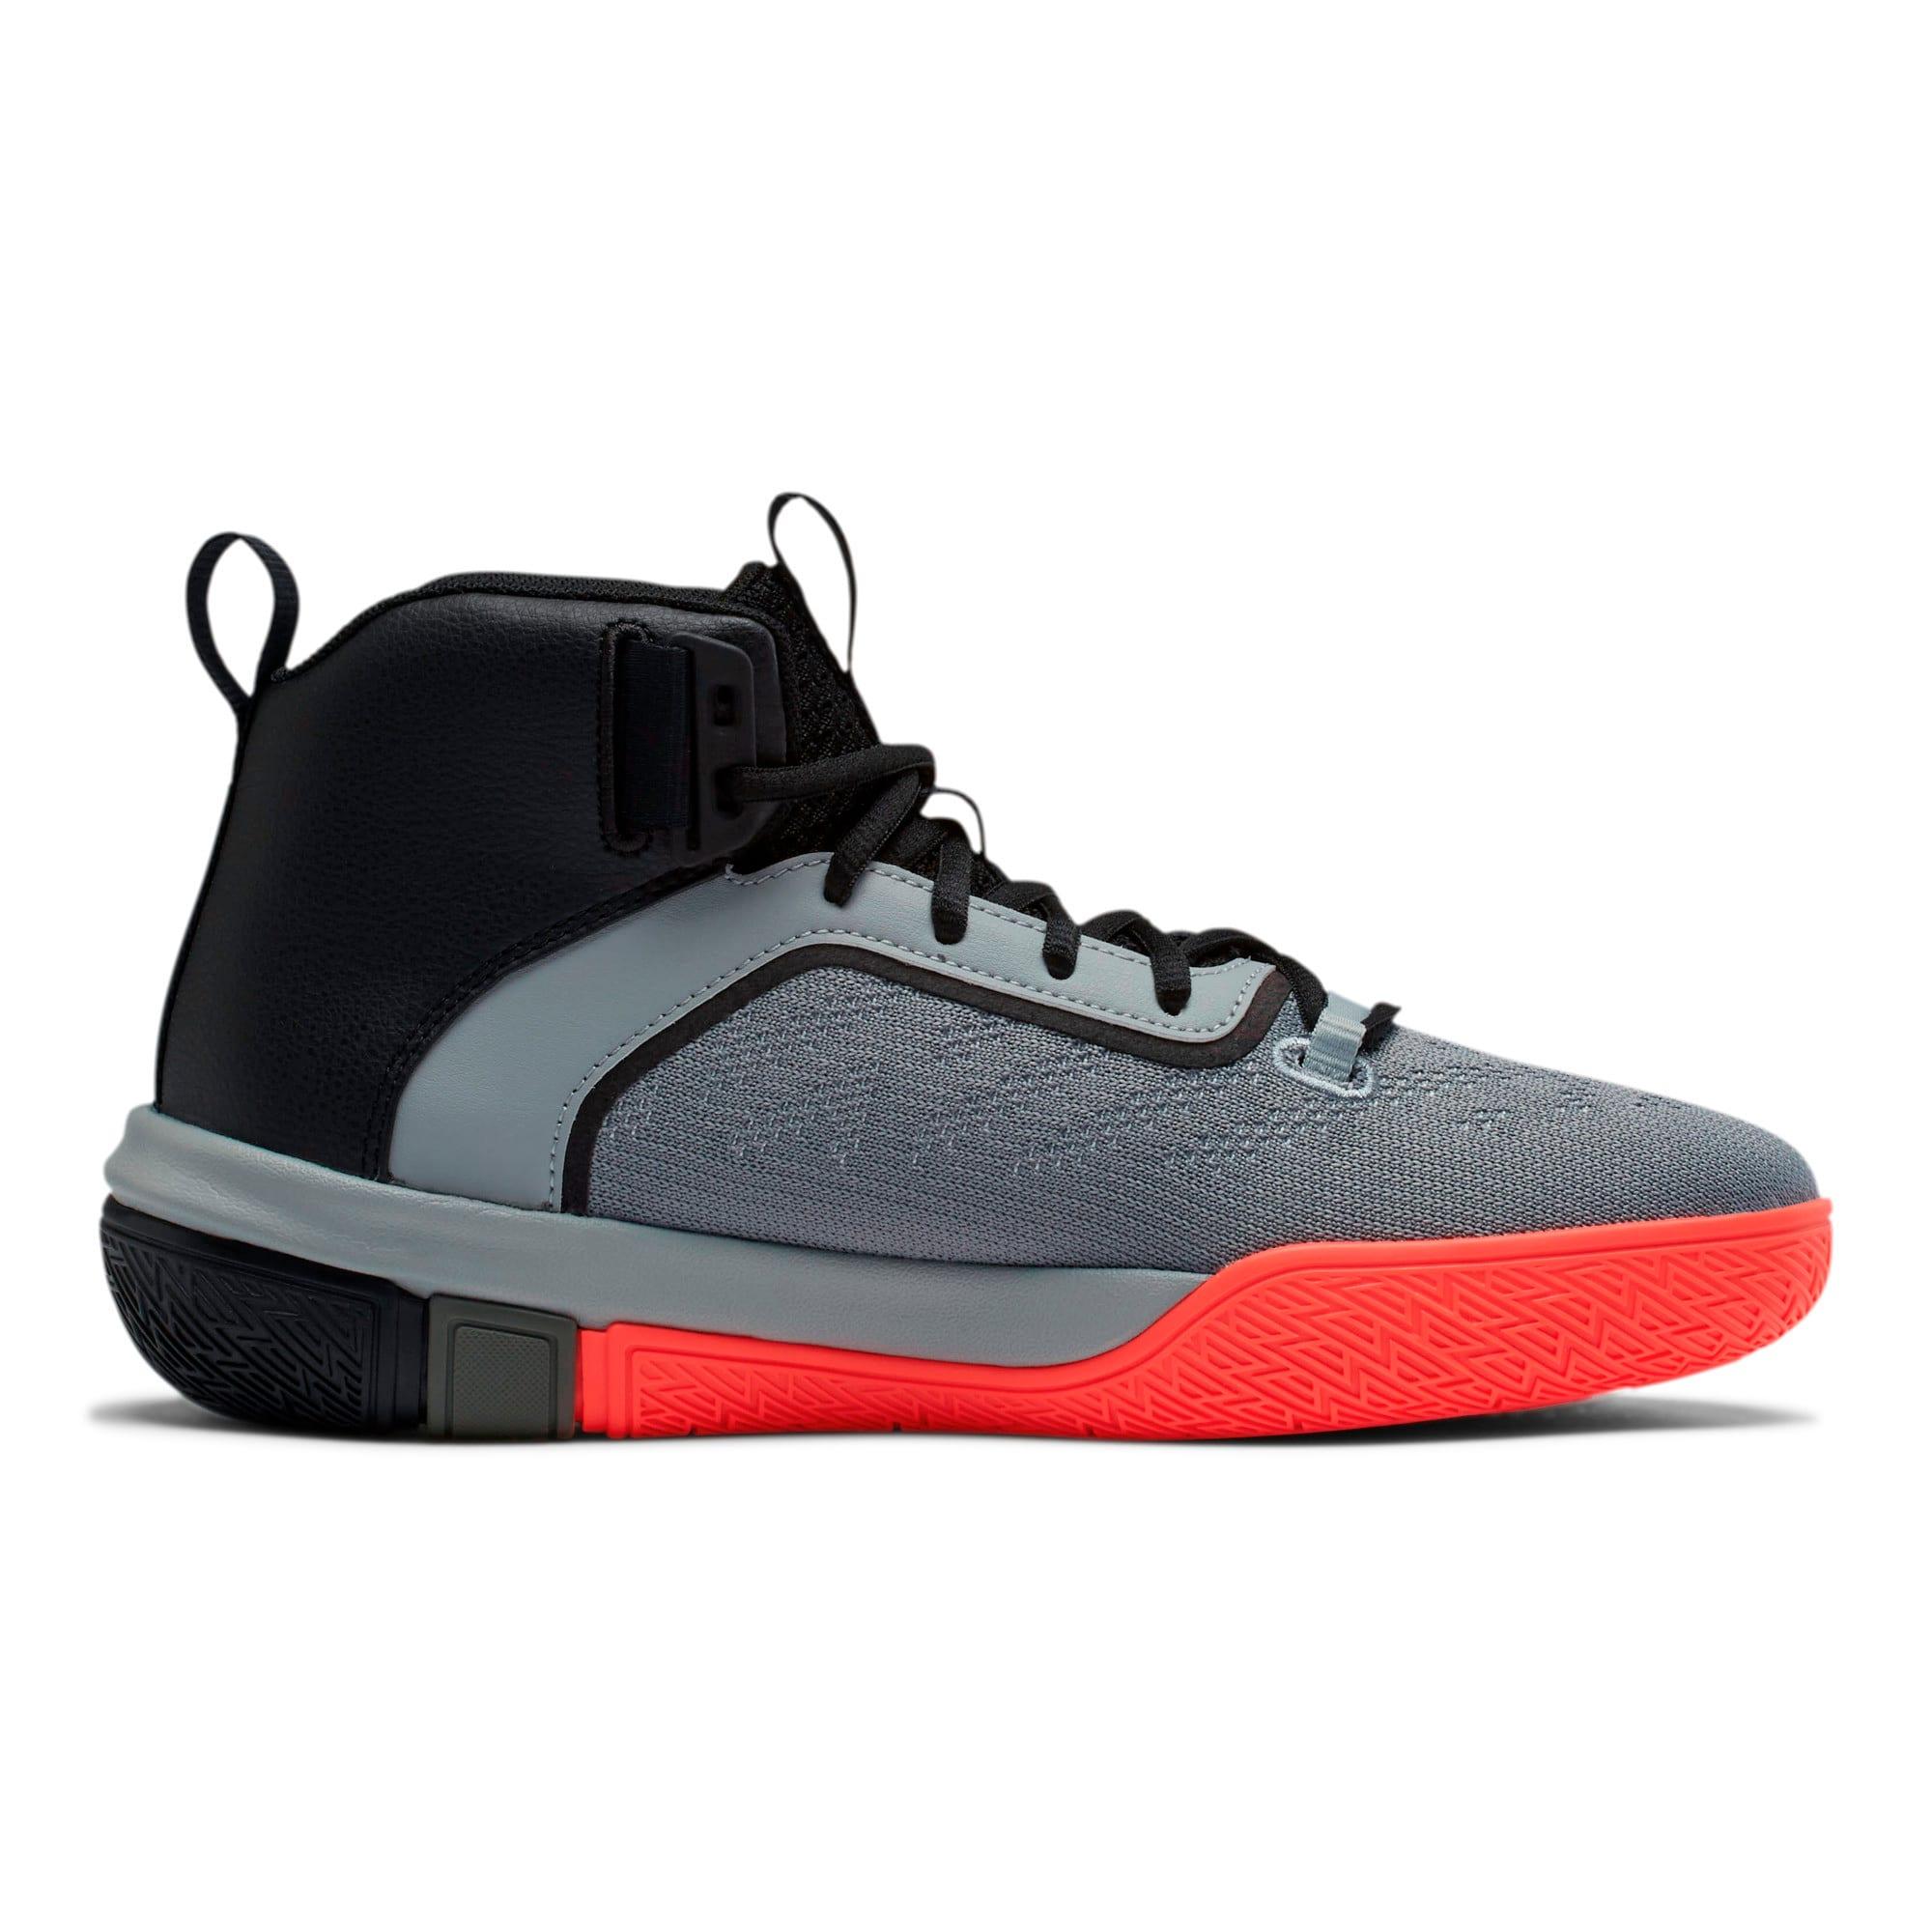 Thumbnail 5 of Legacy Disrupt Basketball Shoes, Puma Black-Red Blast, medium